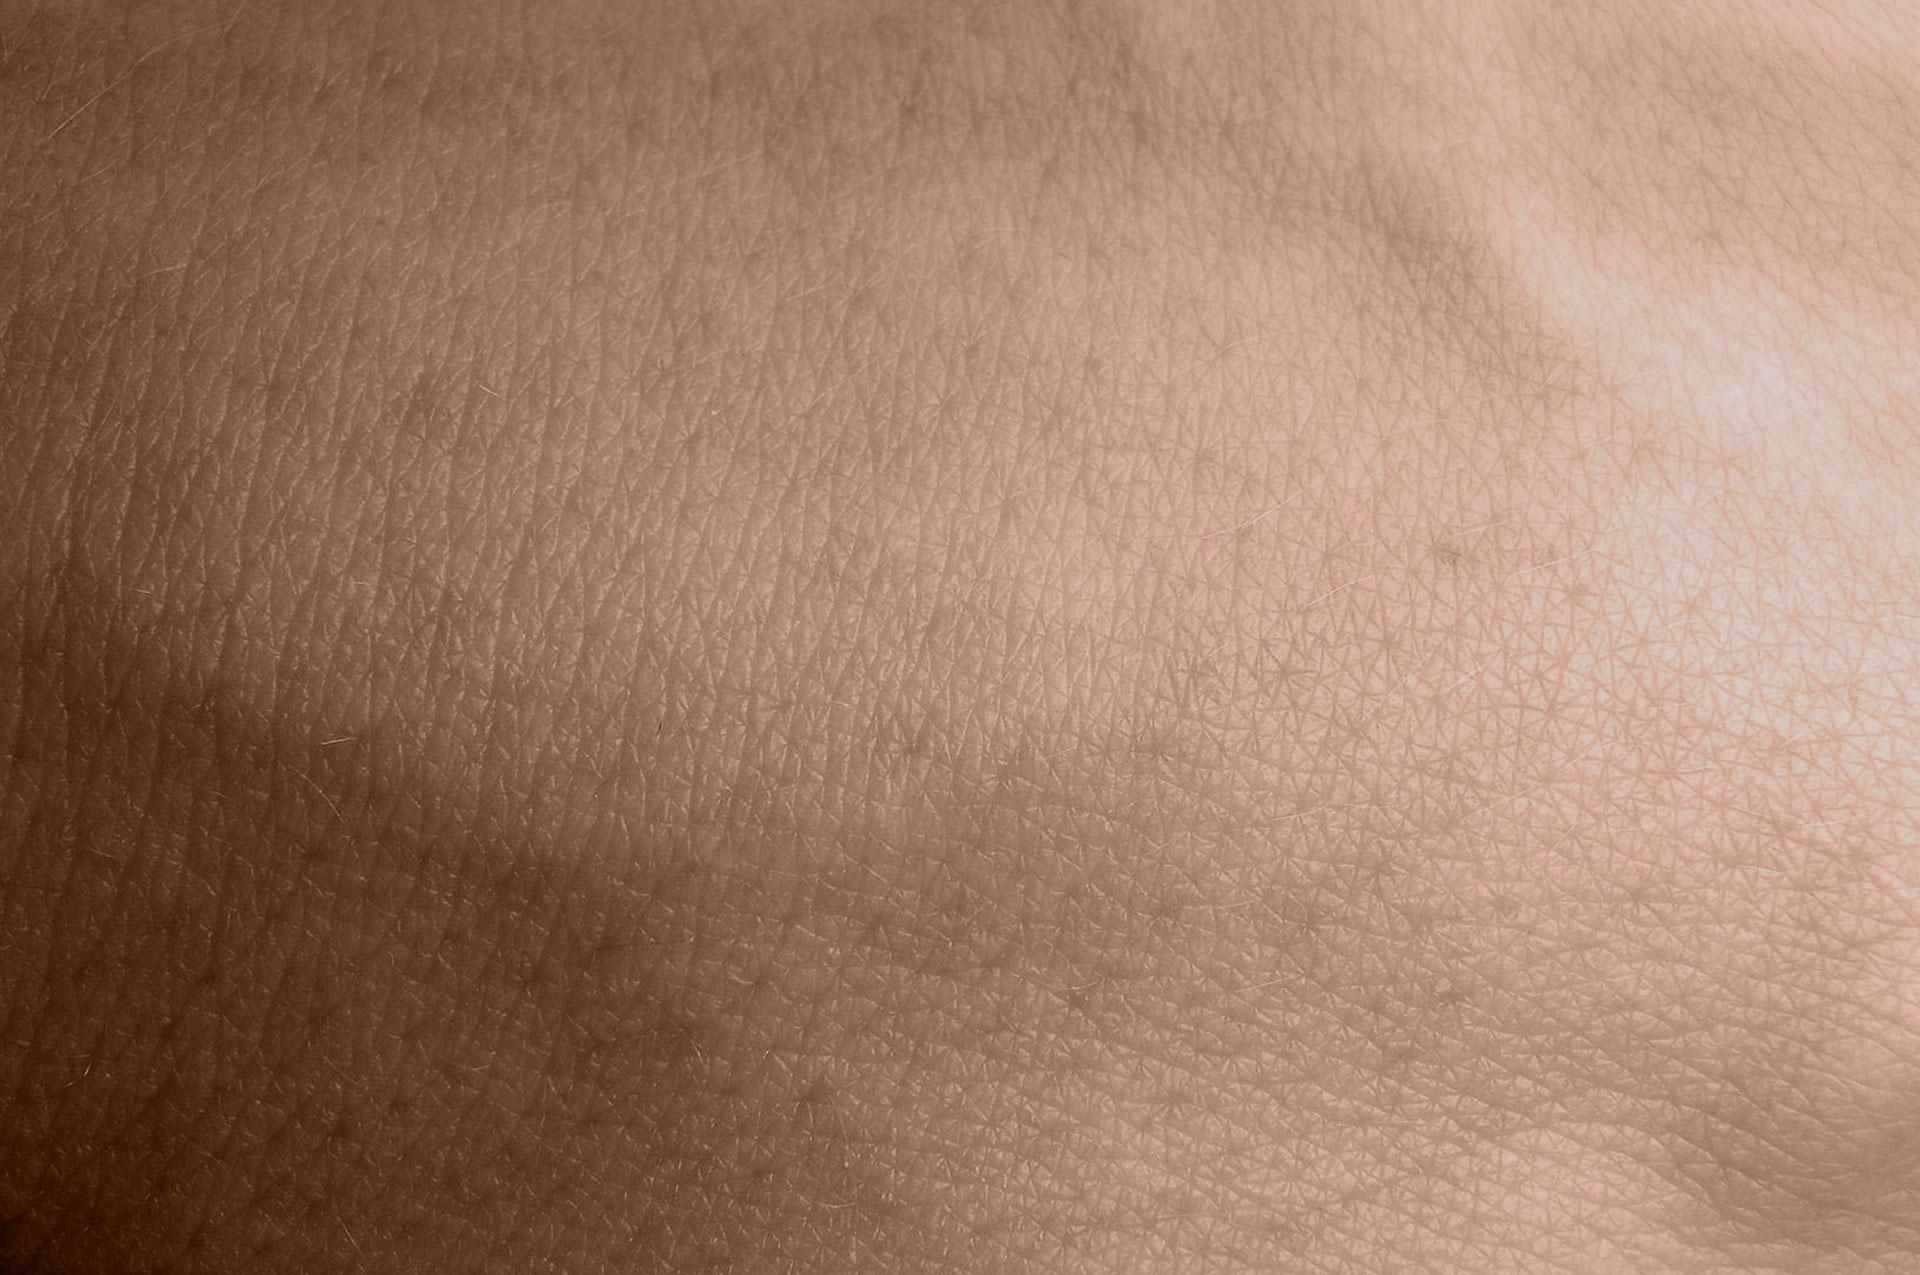 Haut Detail